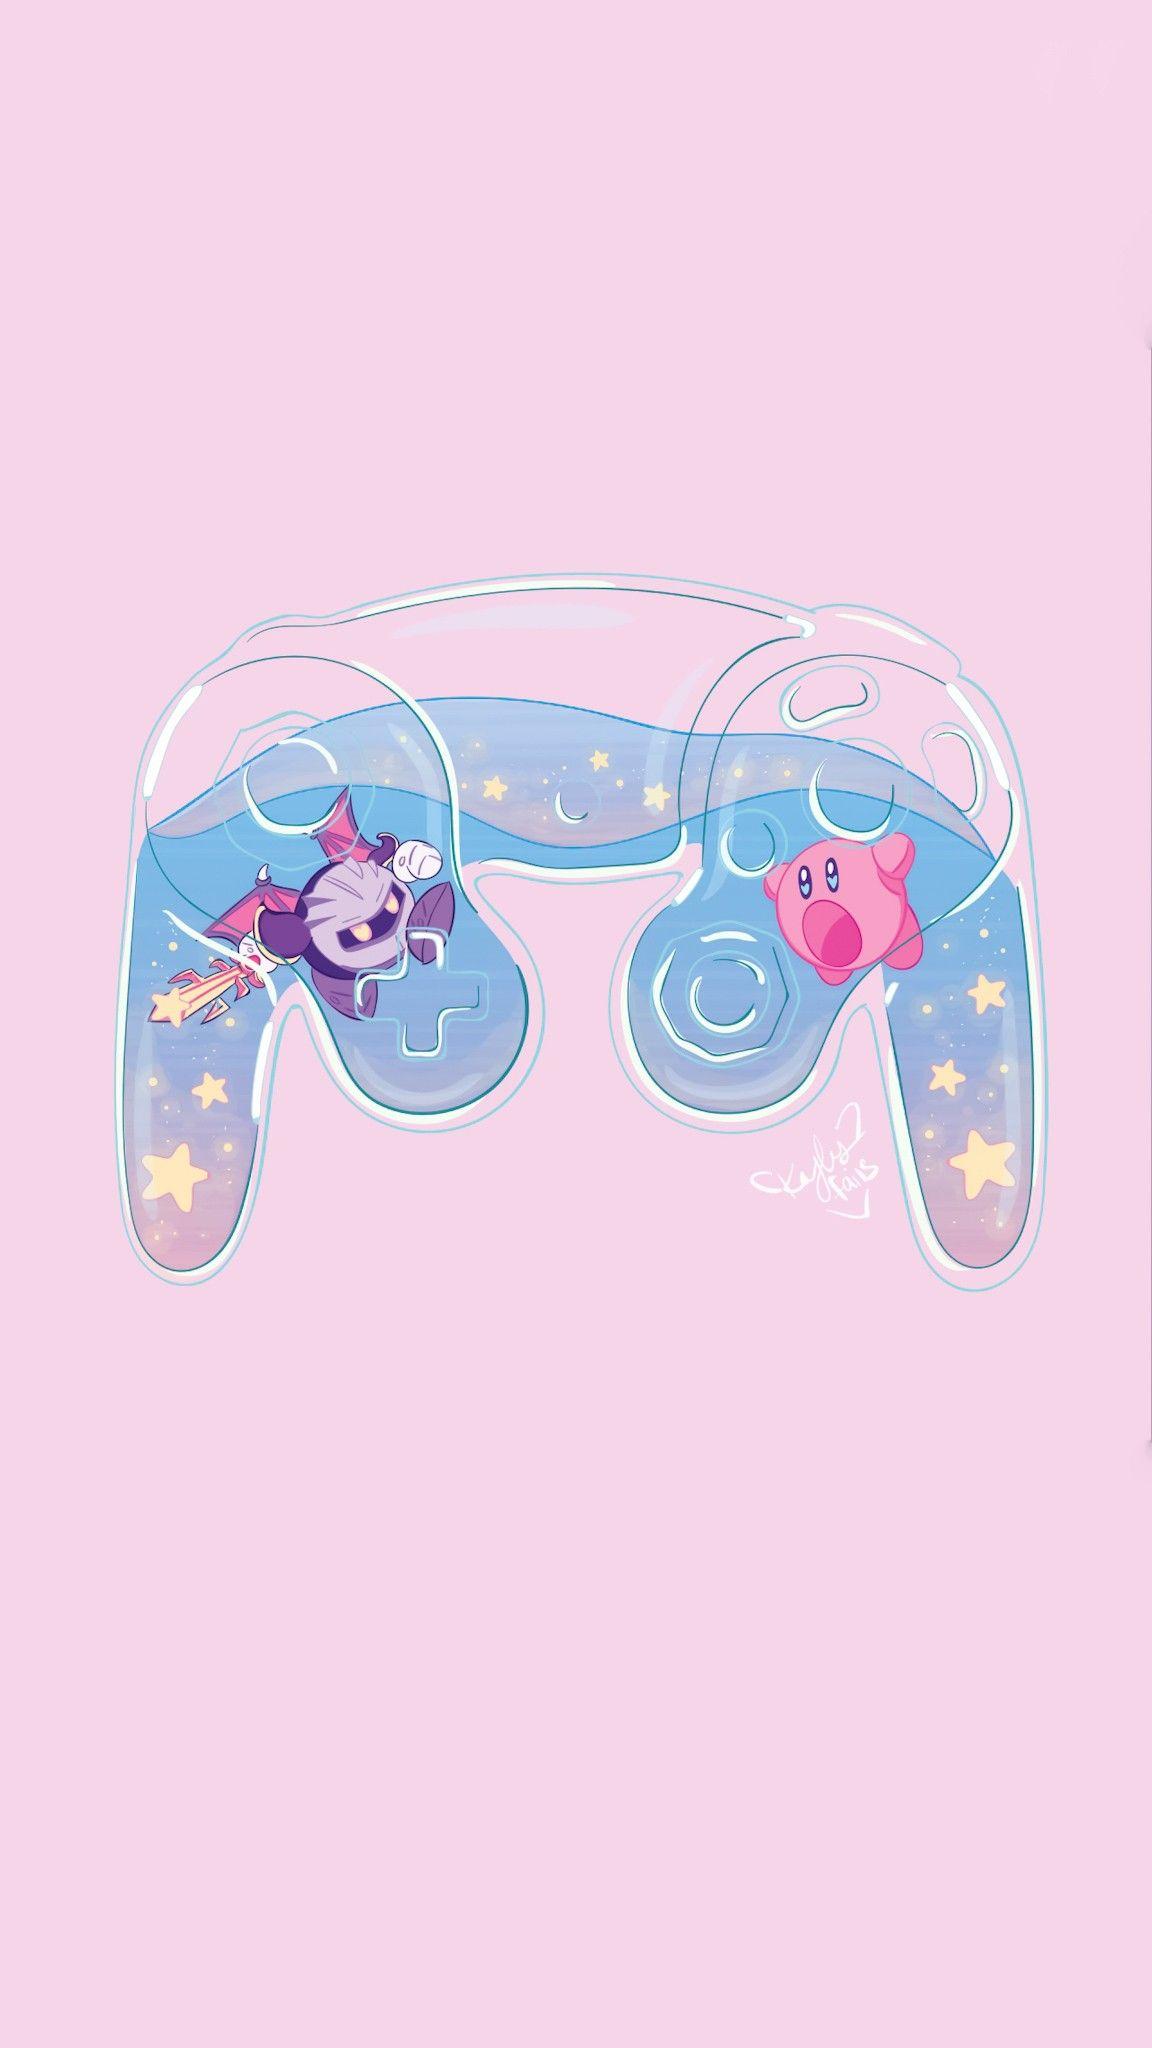 Pin By Aekkalisa On Kirby Bg Kirby Art Anime Wallpaper Kawaii Wallpaper